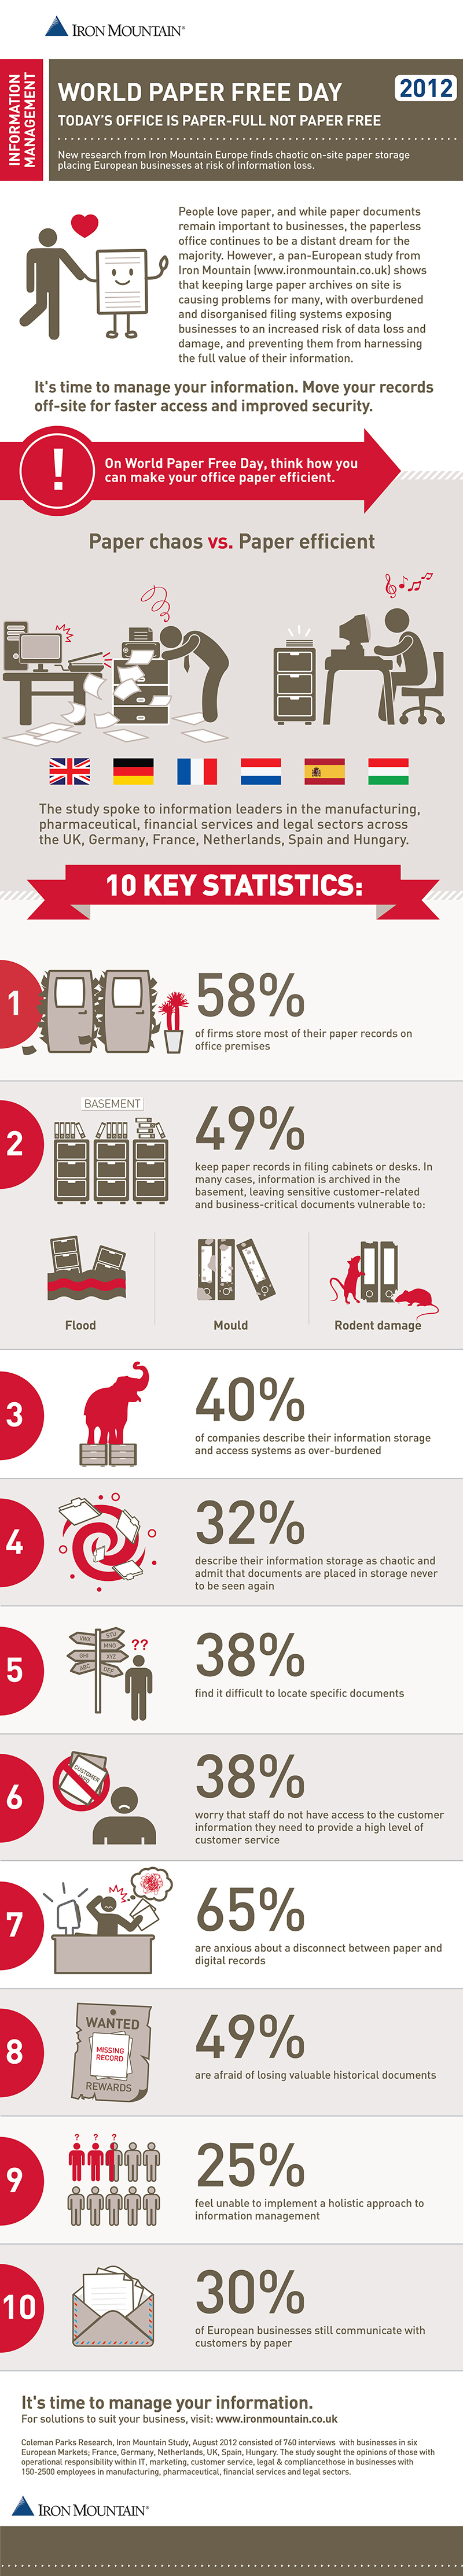 10 Key Statistics of Paper